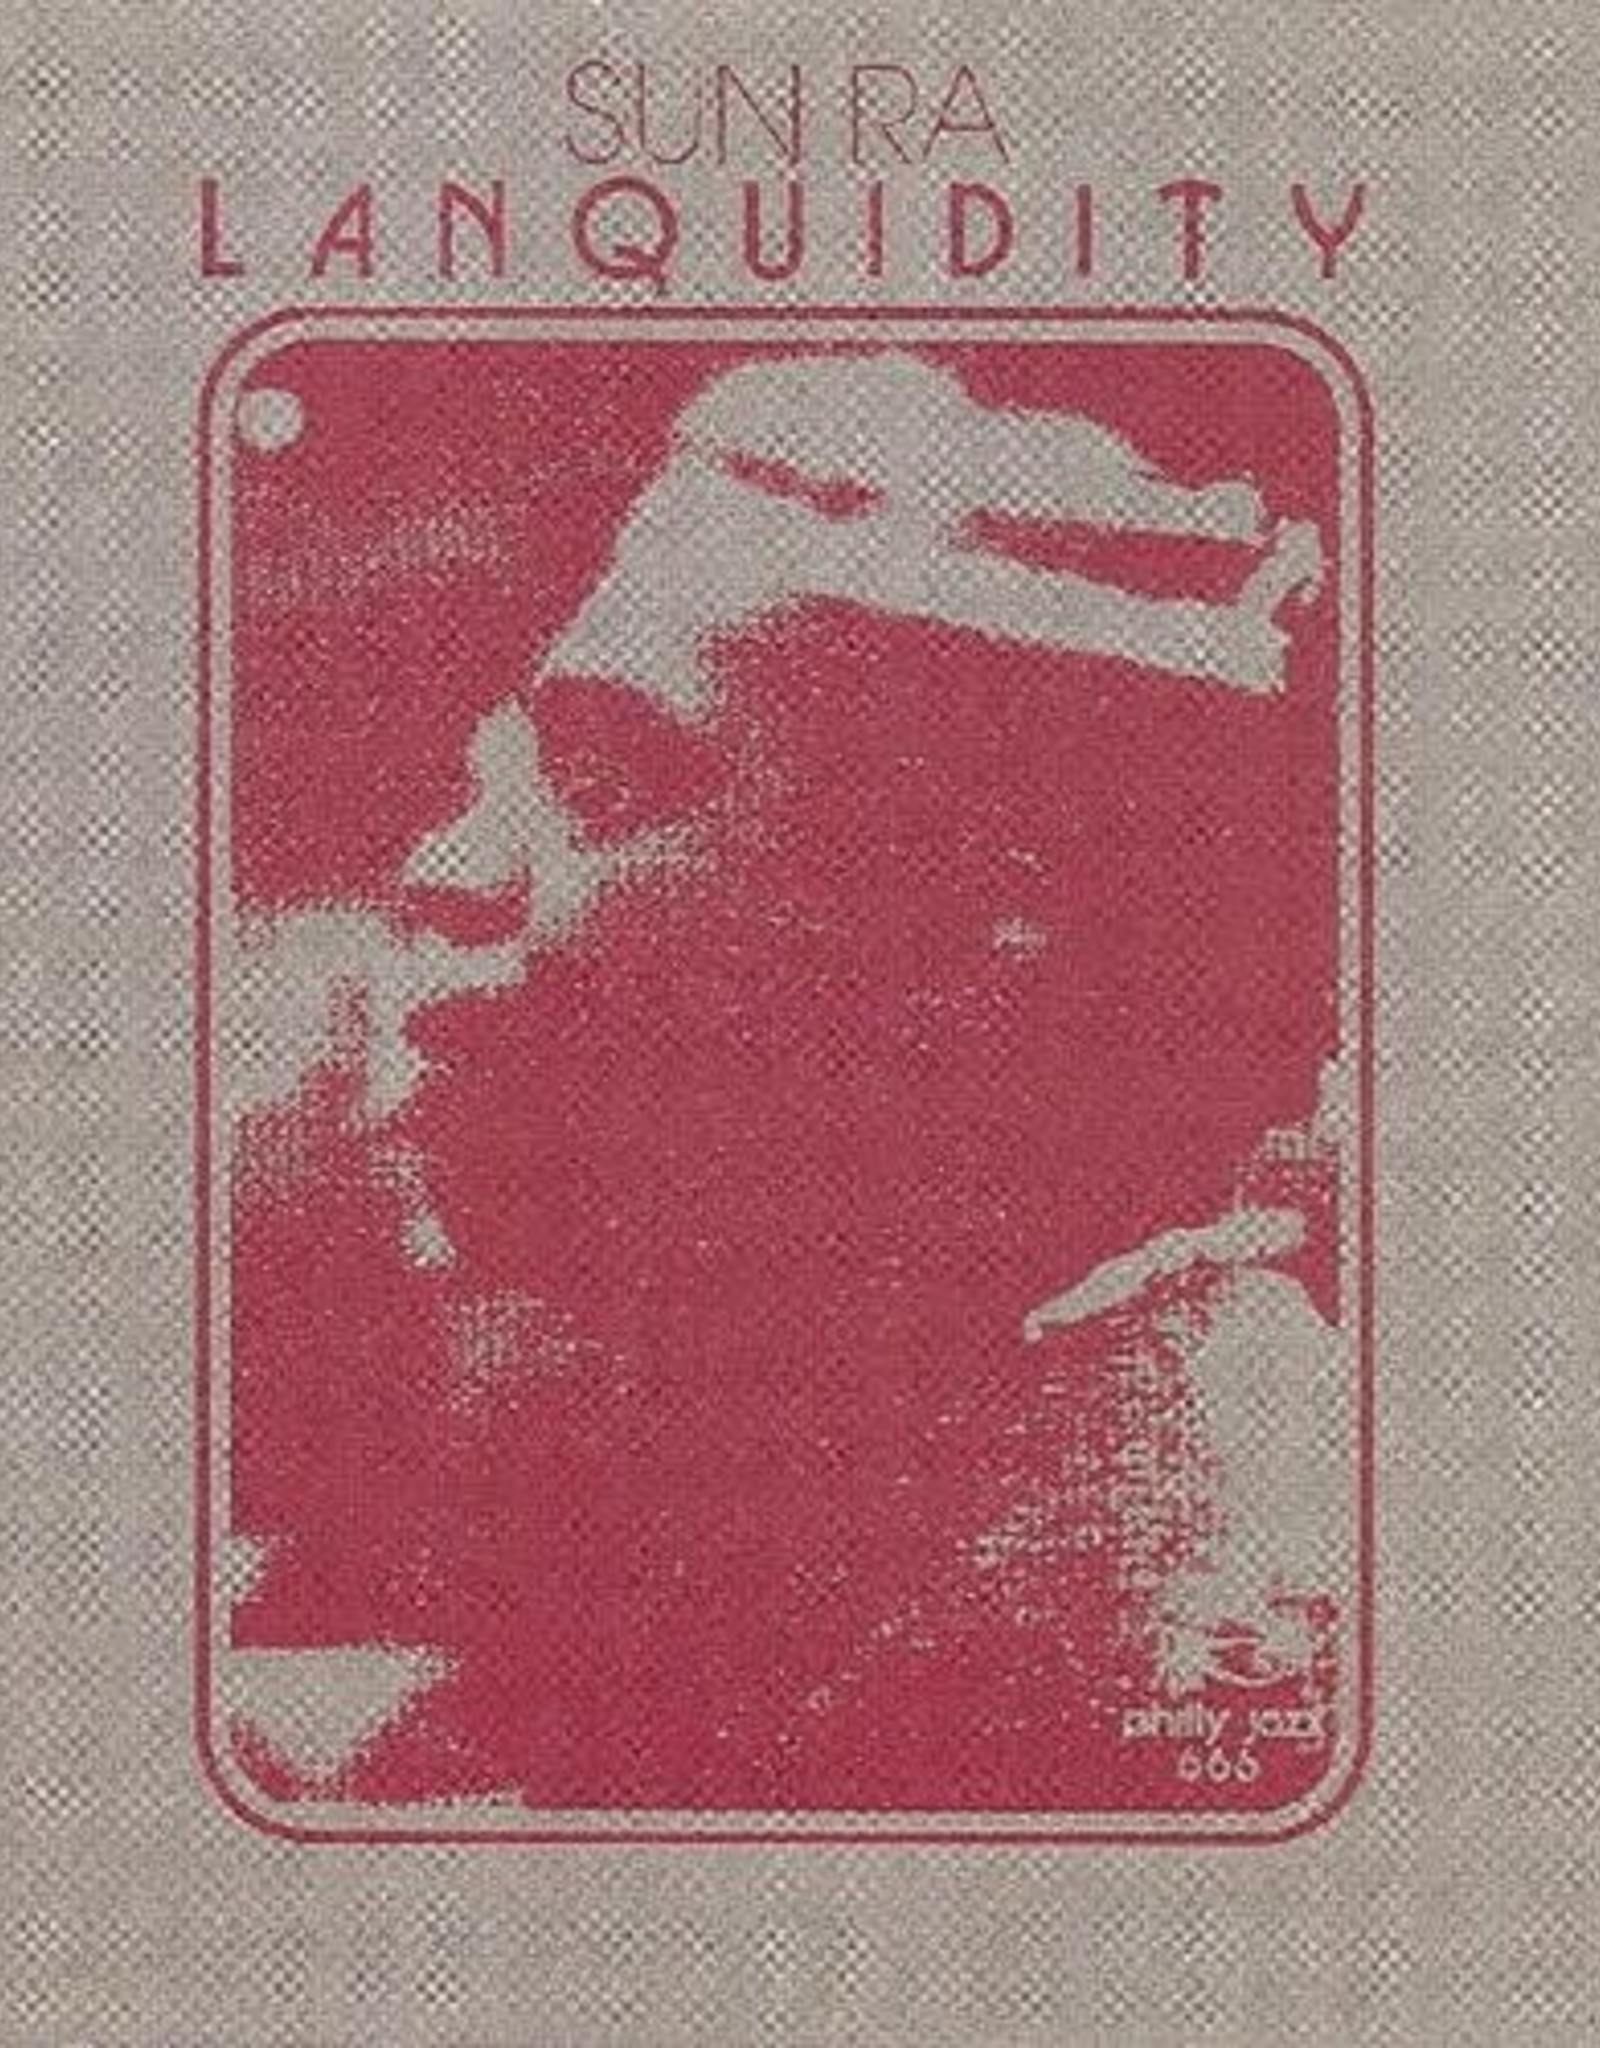 Sun Ra - Lanquidity (4LP Box Set Edition)